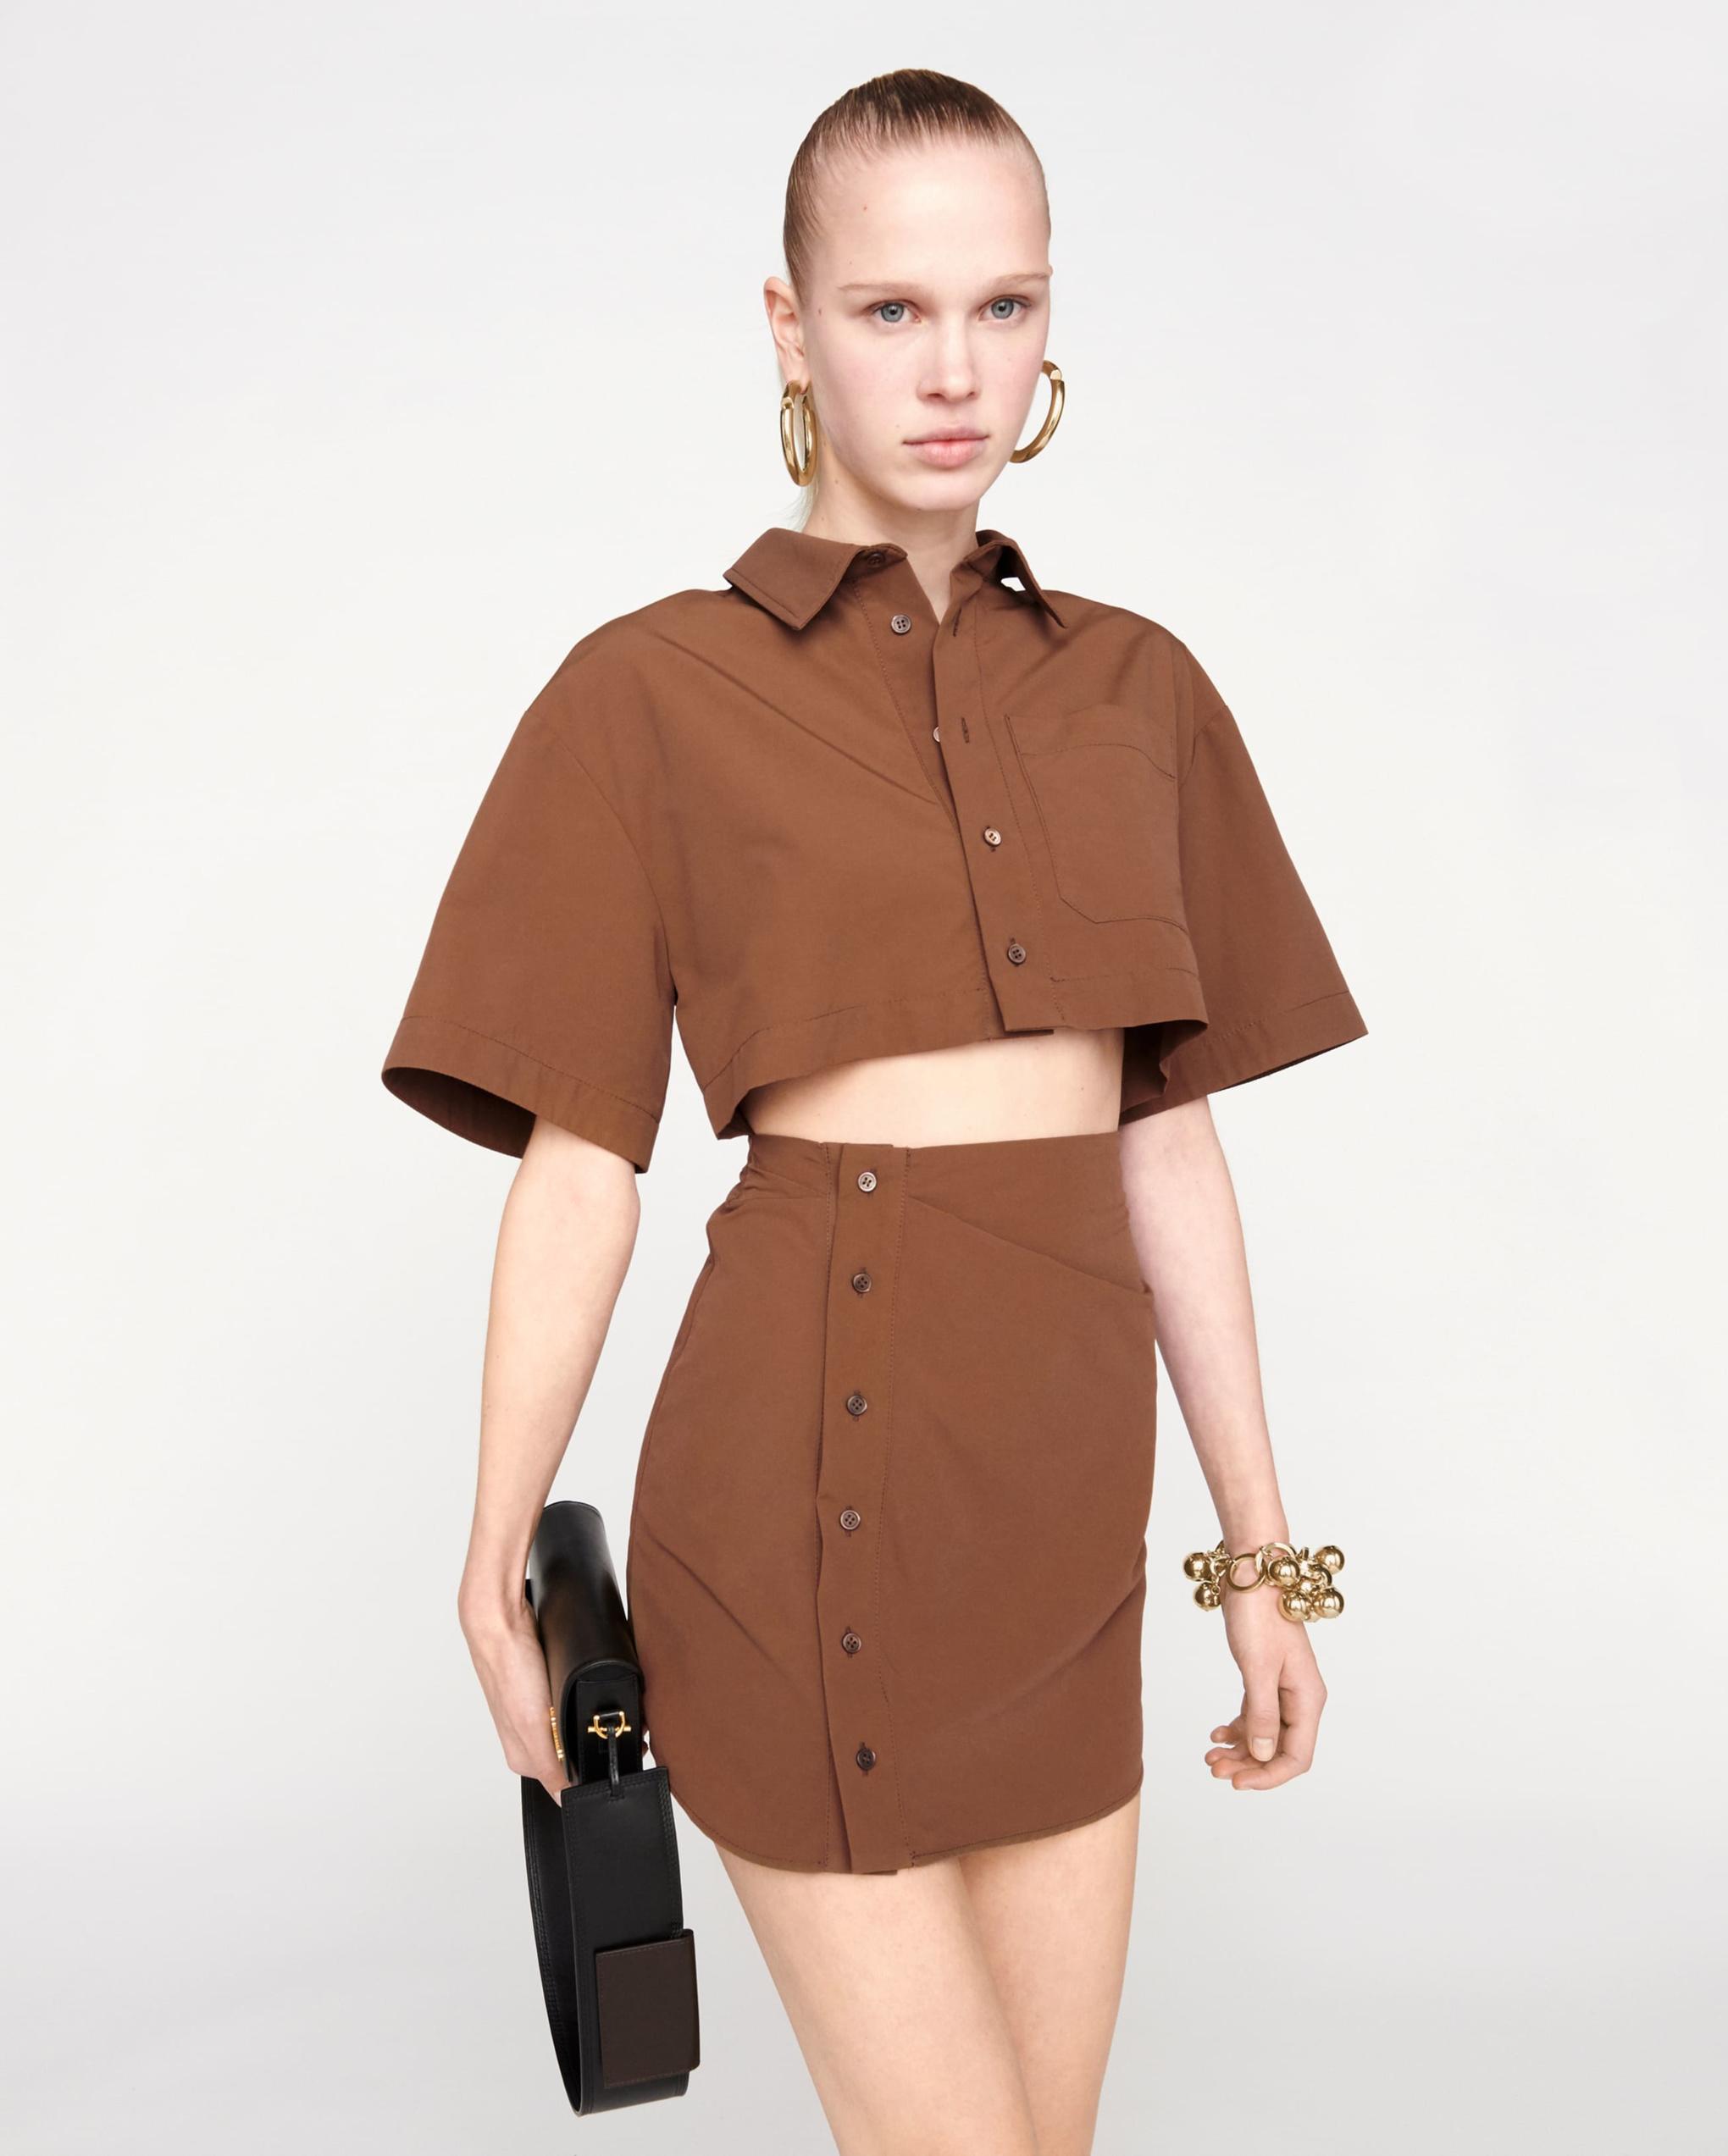 La robe Arles